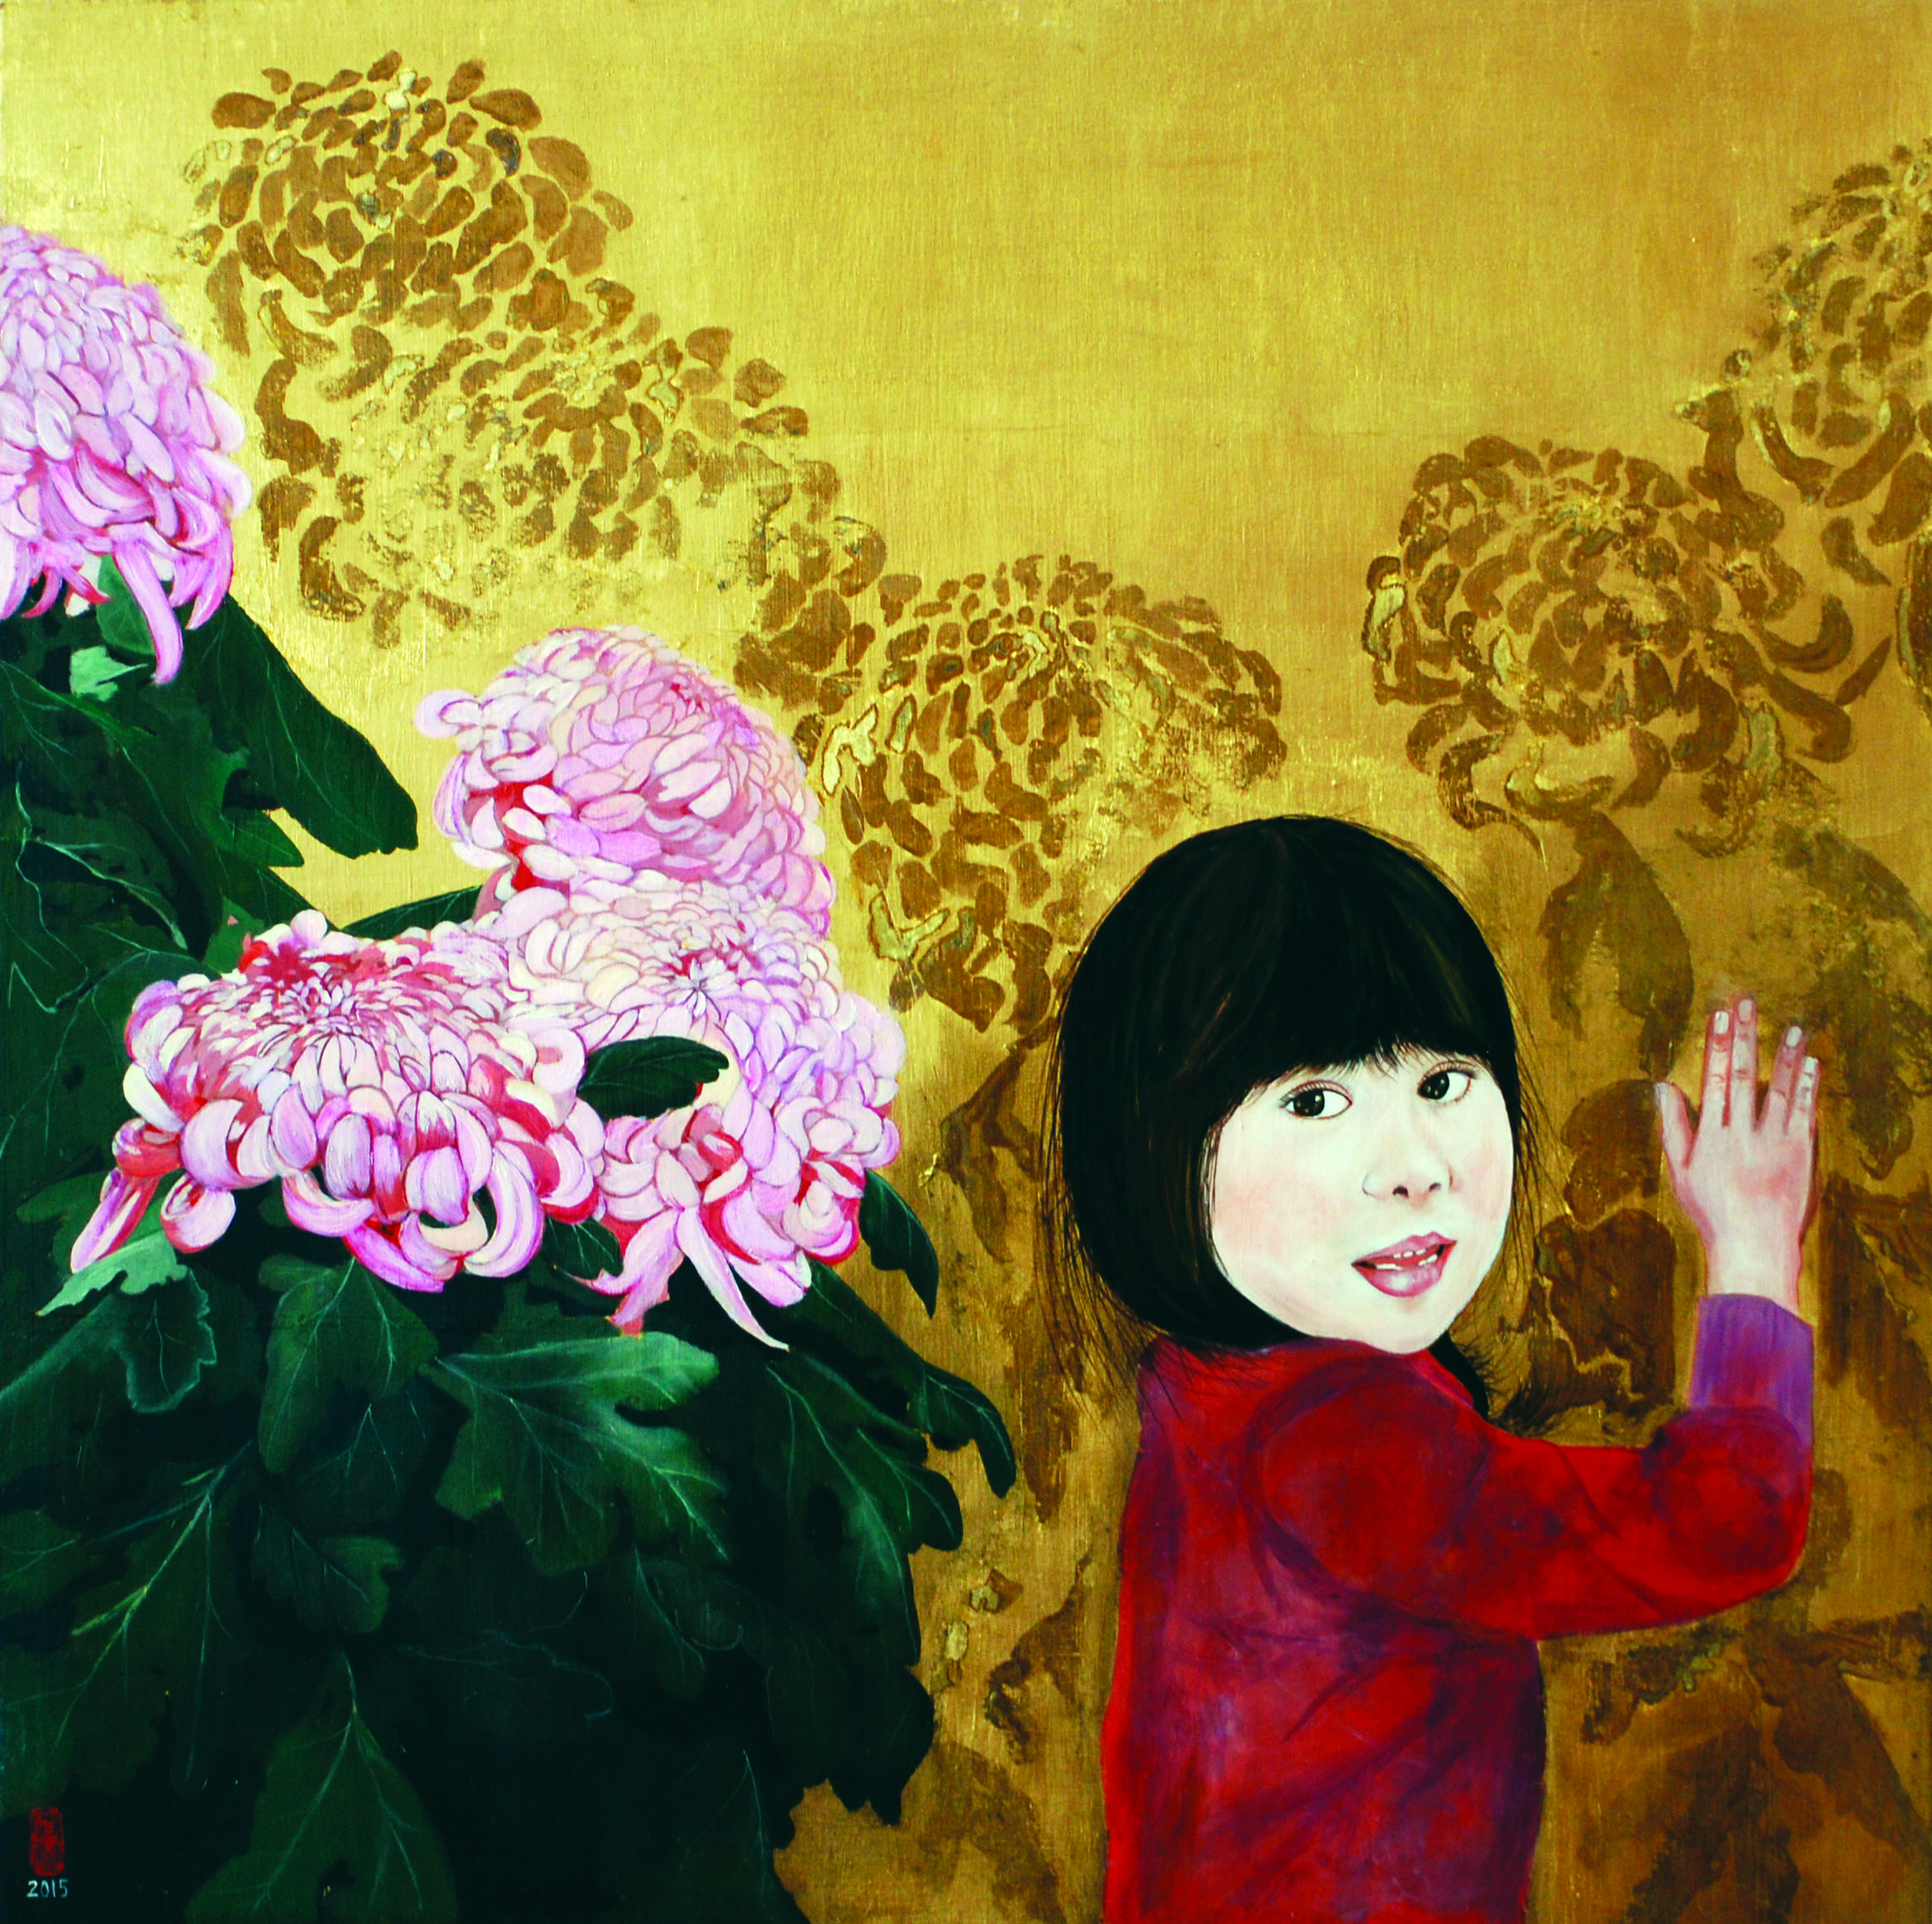 KS-055, Kae Sasaki, Girl with Big Bangs, 2015, Oil and Resin on GoldleafedPanel, 24X24